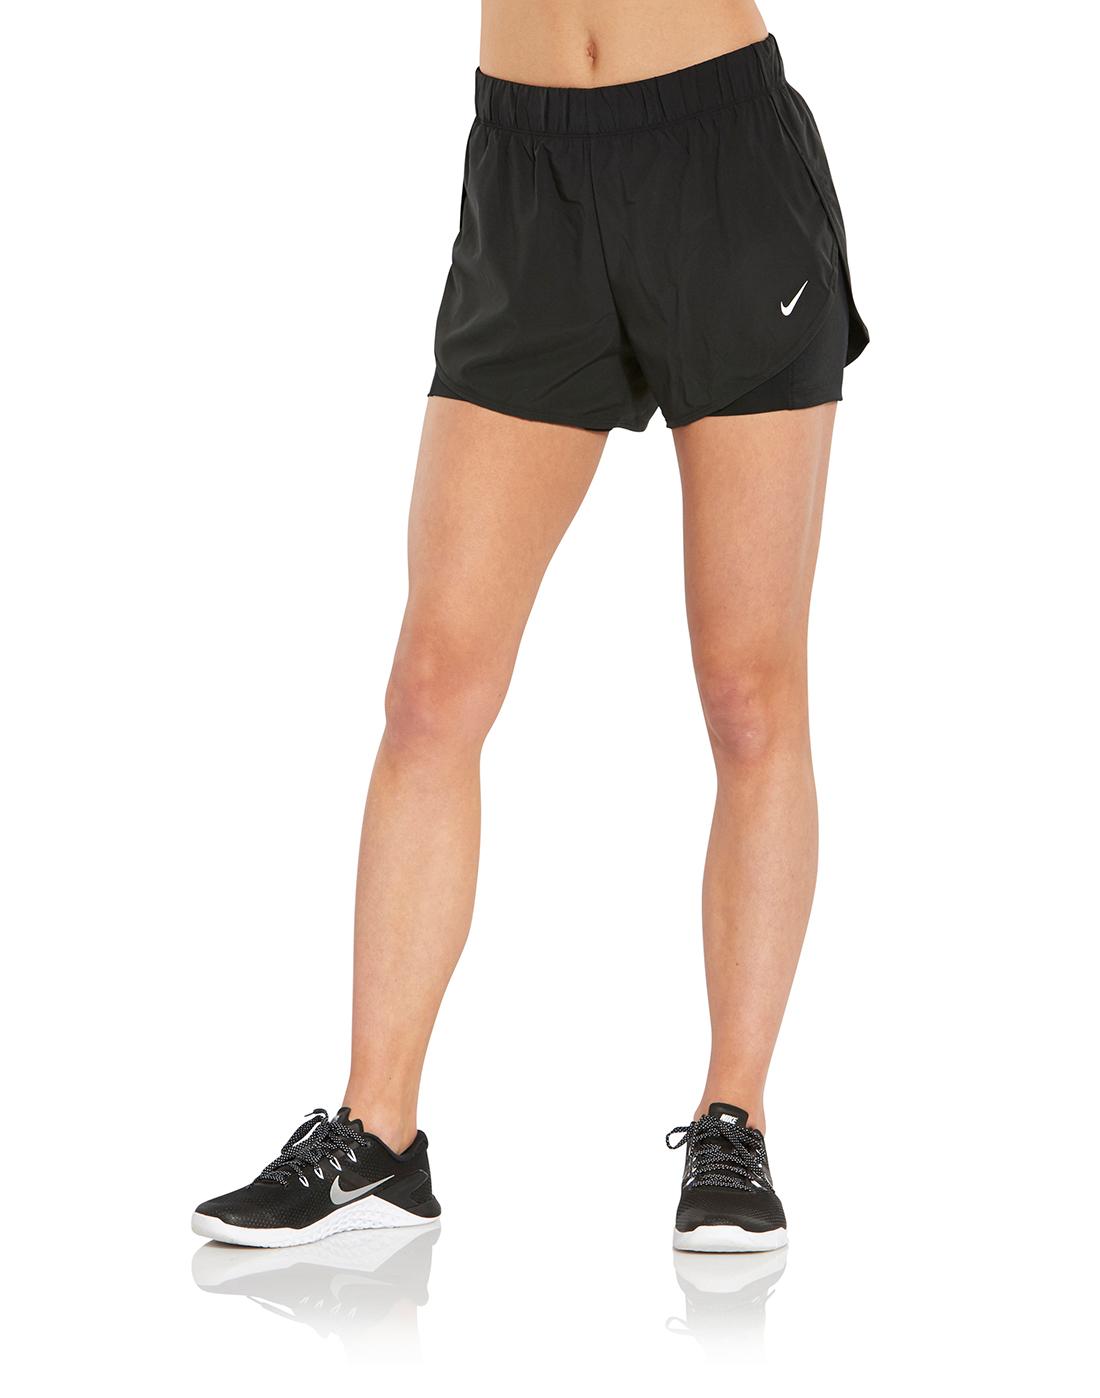 2 in one nike shorts